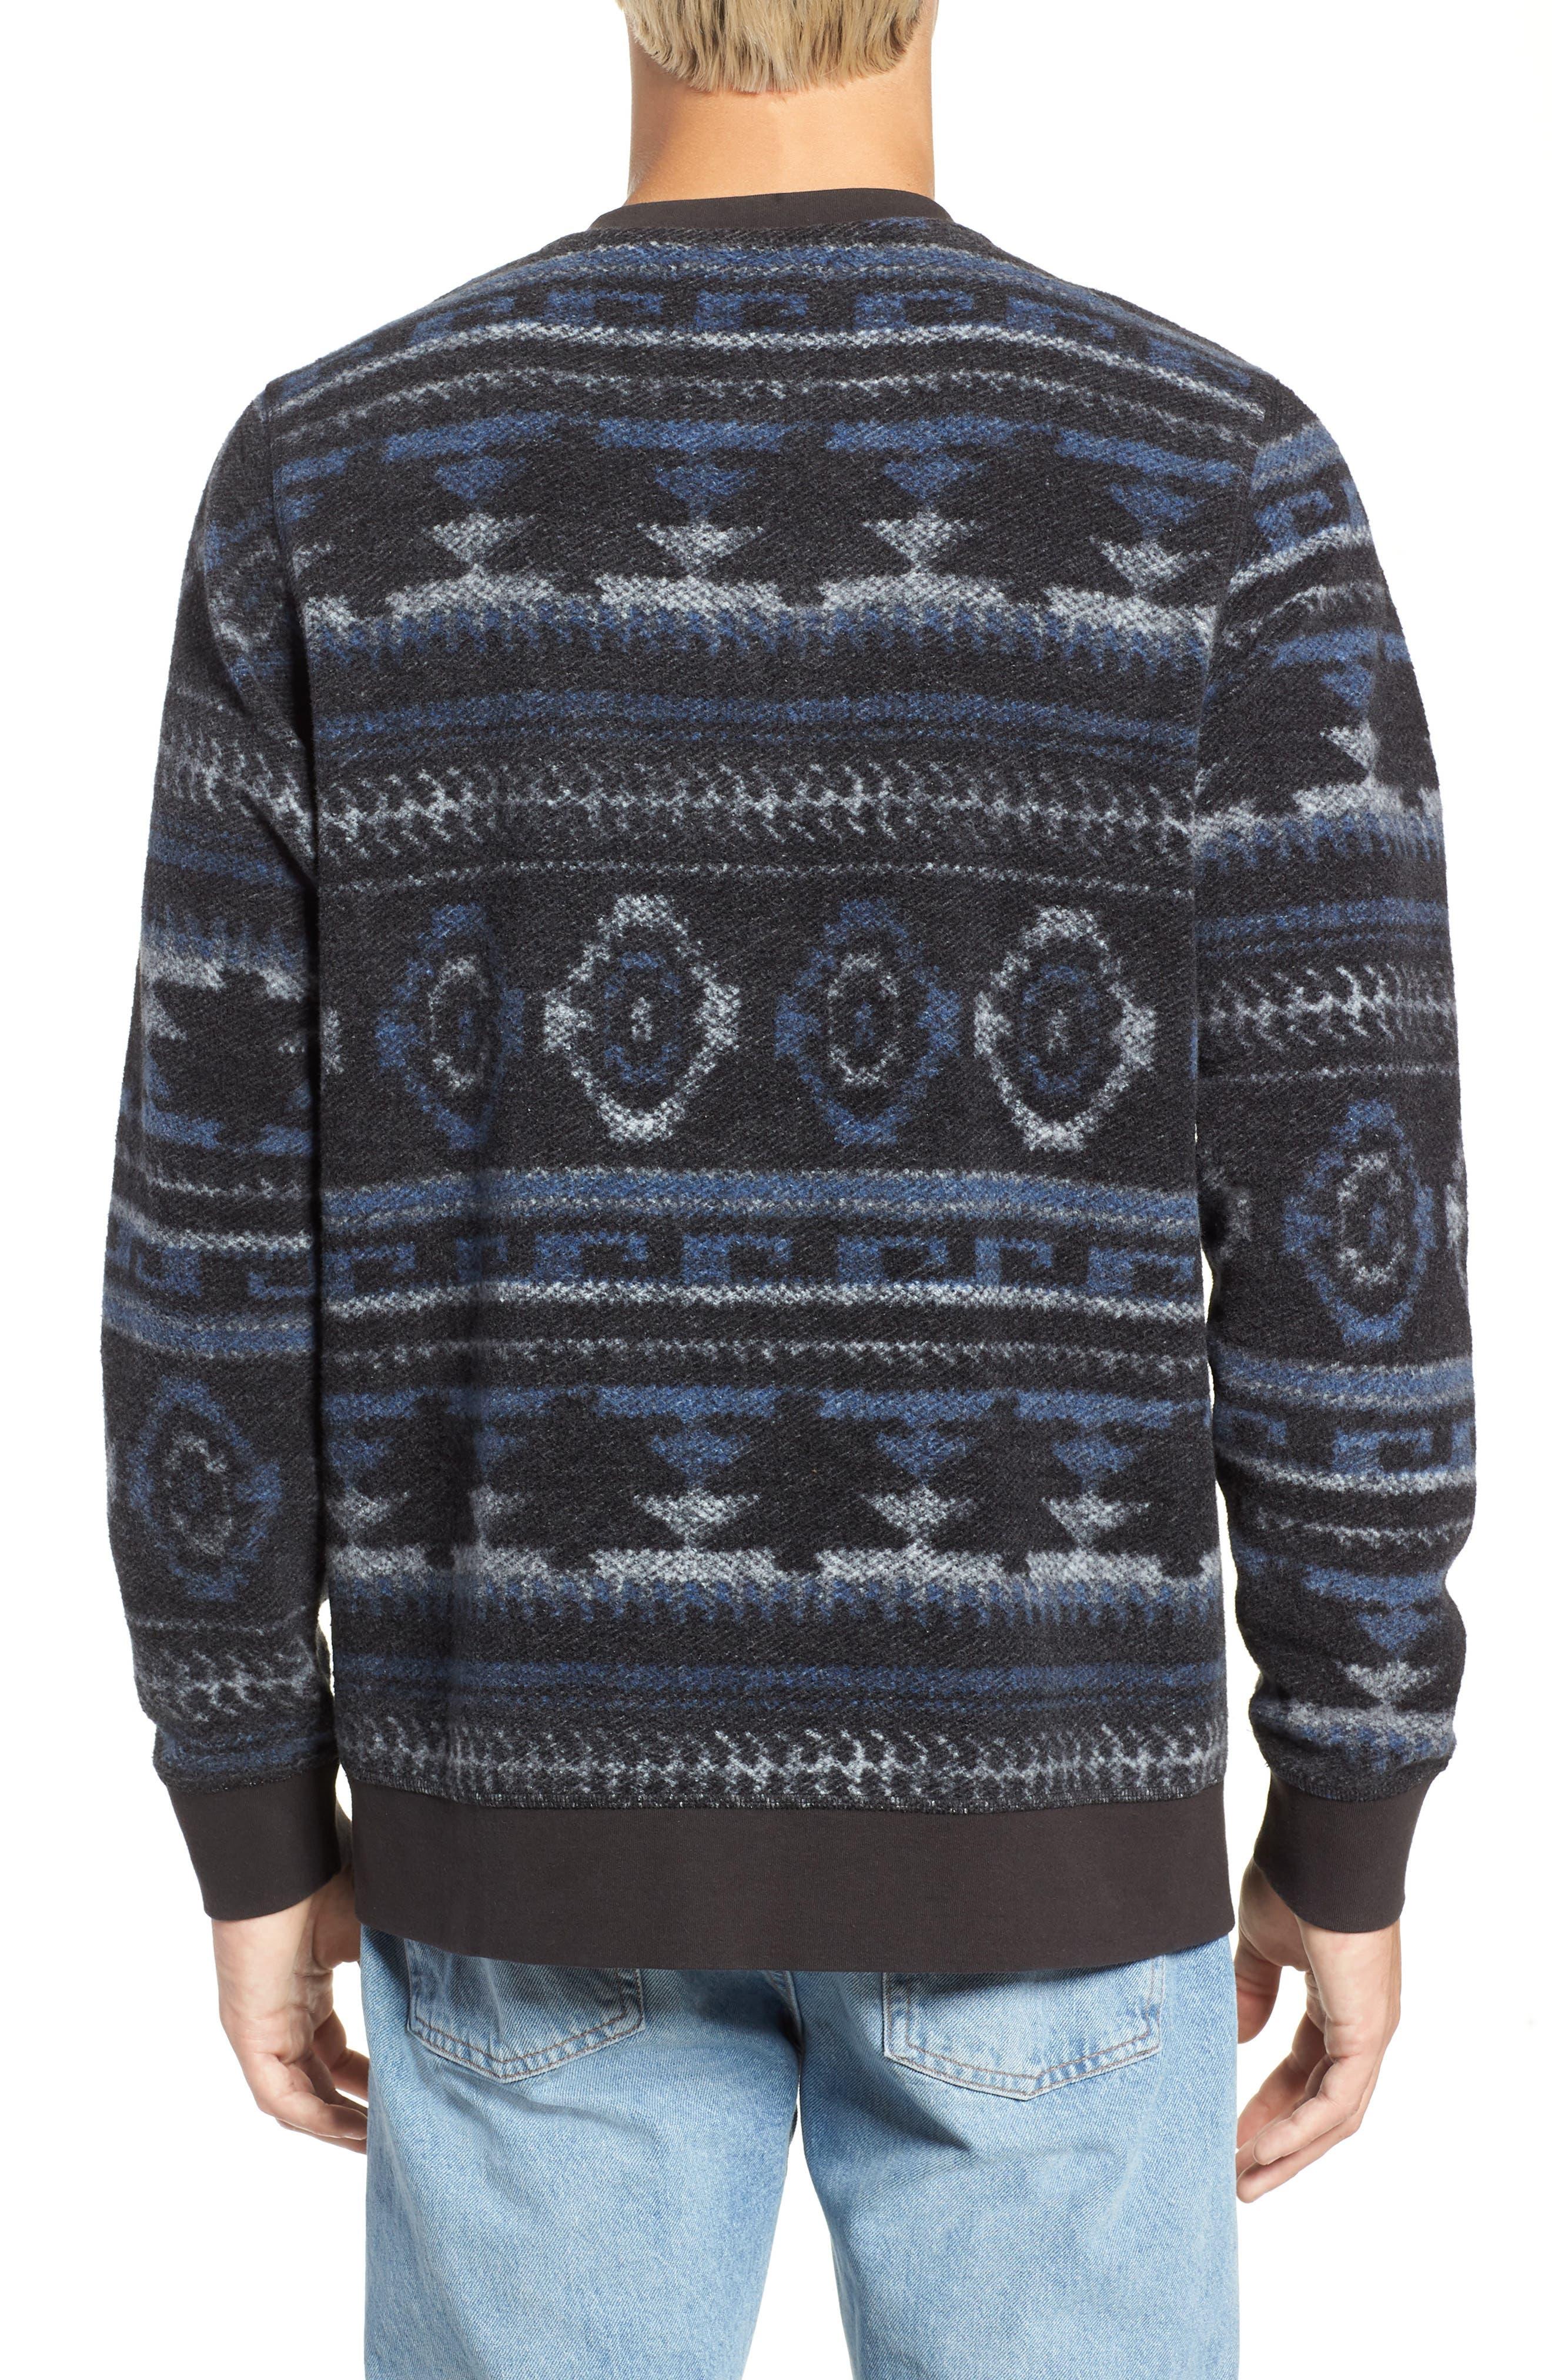 Fleece Sweatshirt,                             Alternate thumbnail 2, color,                             020